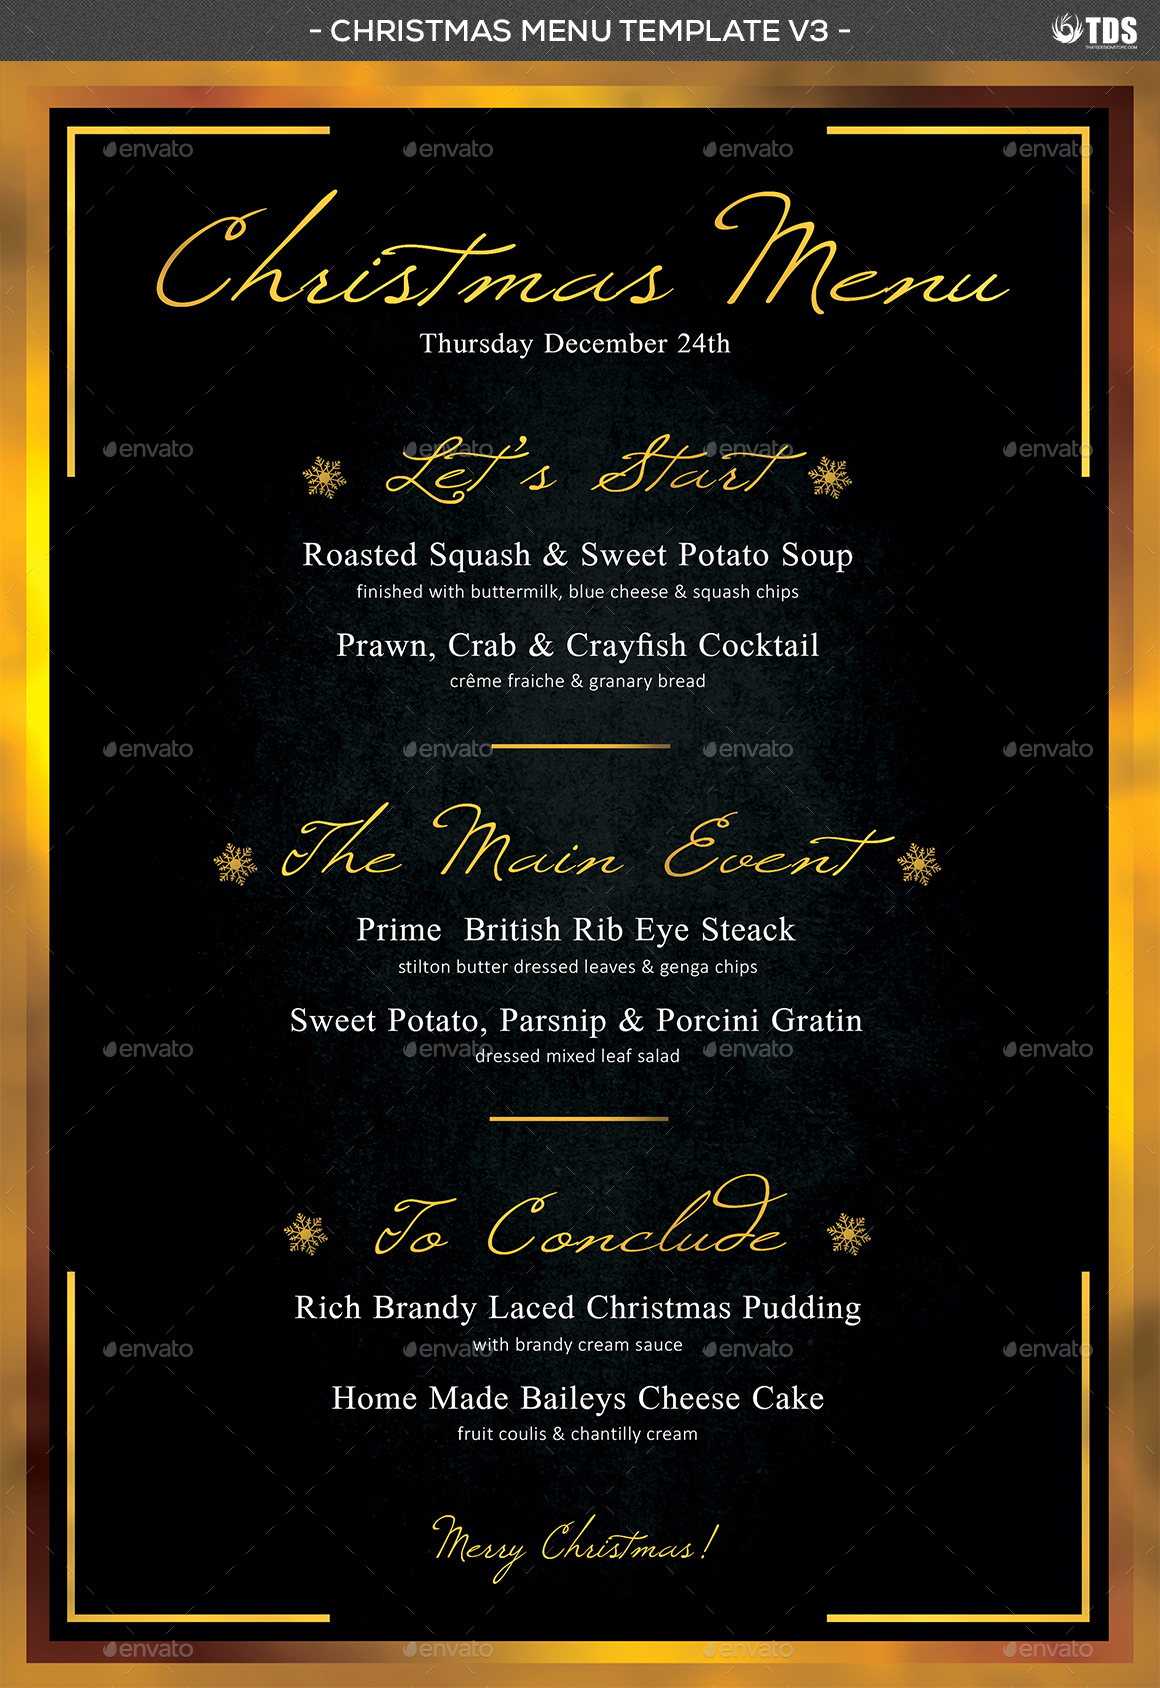 christmas menu template v3 by lou606 graphicriver 01 christmas menu template v3 jpg 02 christmas menu template v3 jpg 03 christmas menu template v3 jpg